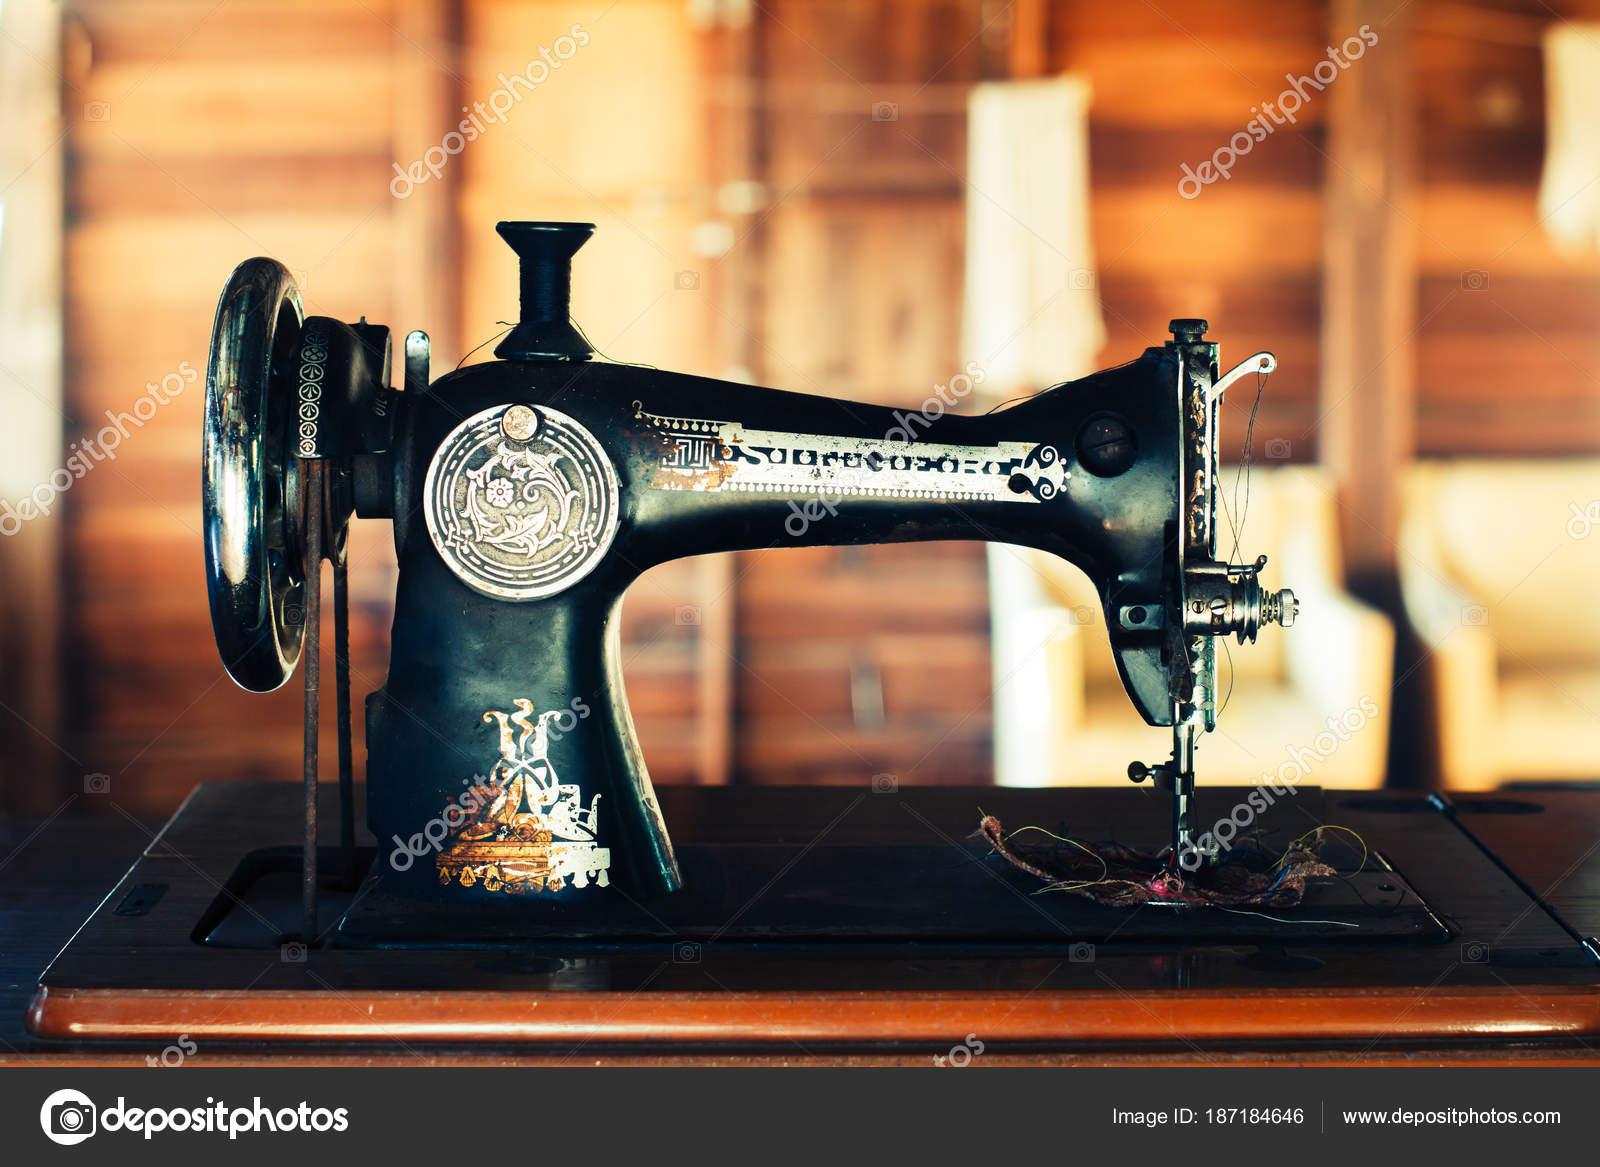 alte Nähmaschine — Stockfoto © Yuthana_stock #187184646